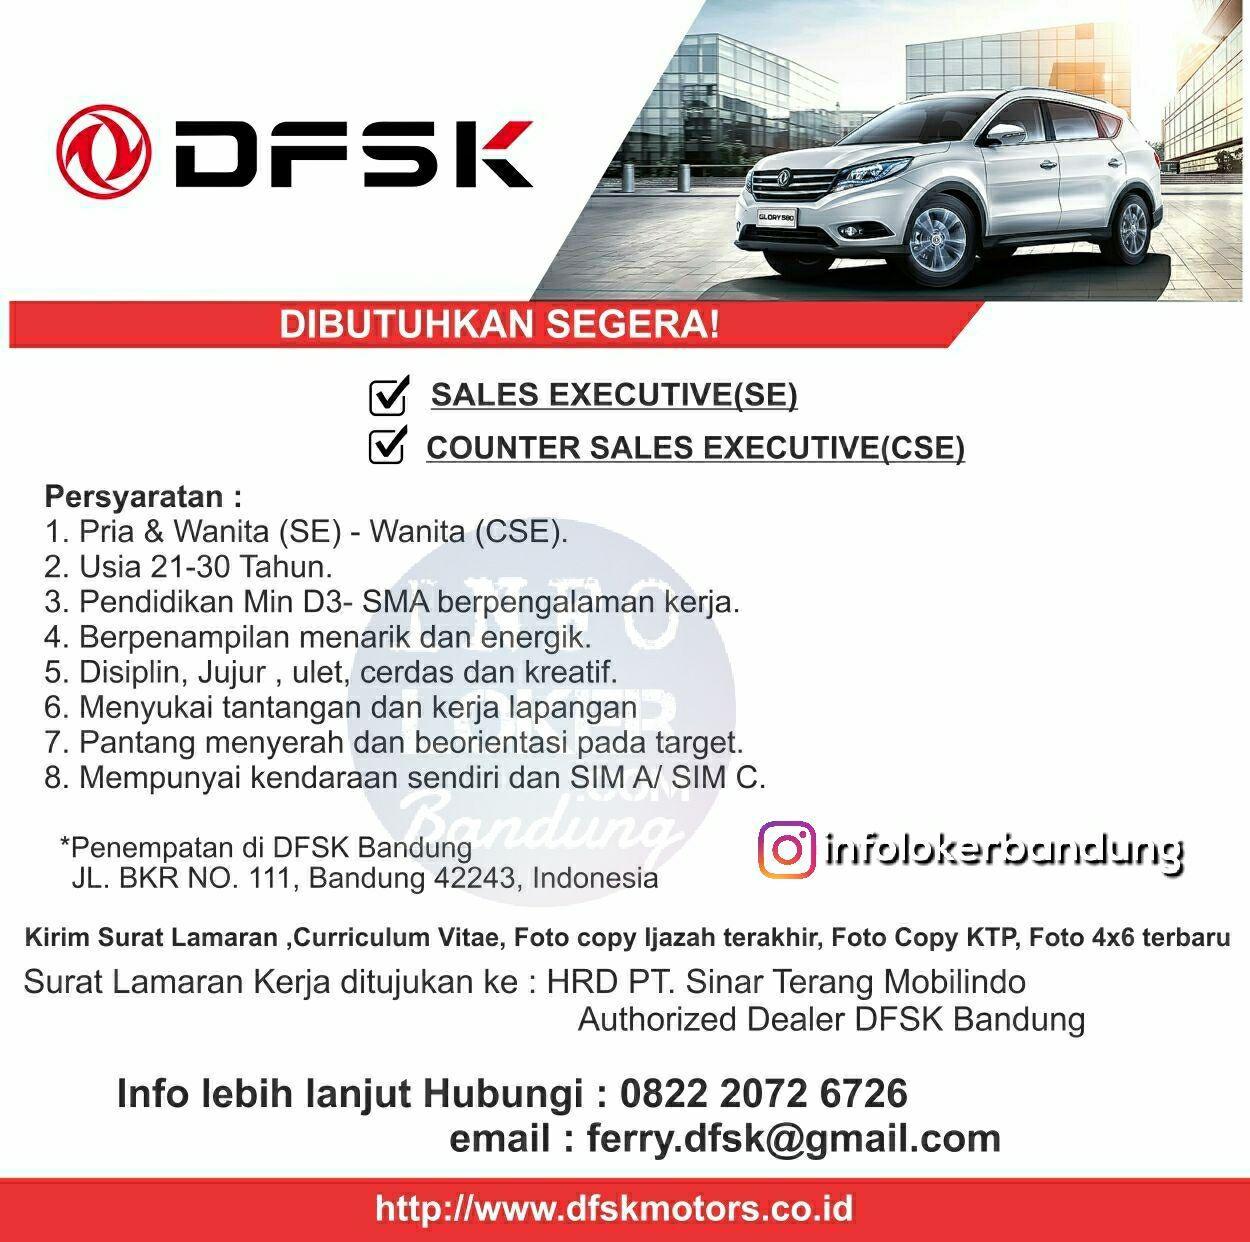 Lowongan Kerja PT. Sinar Terang Mobilindo ( Authorized DFSK) Bandung Maret 2018